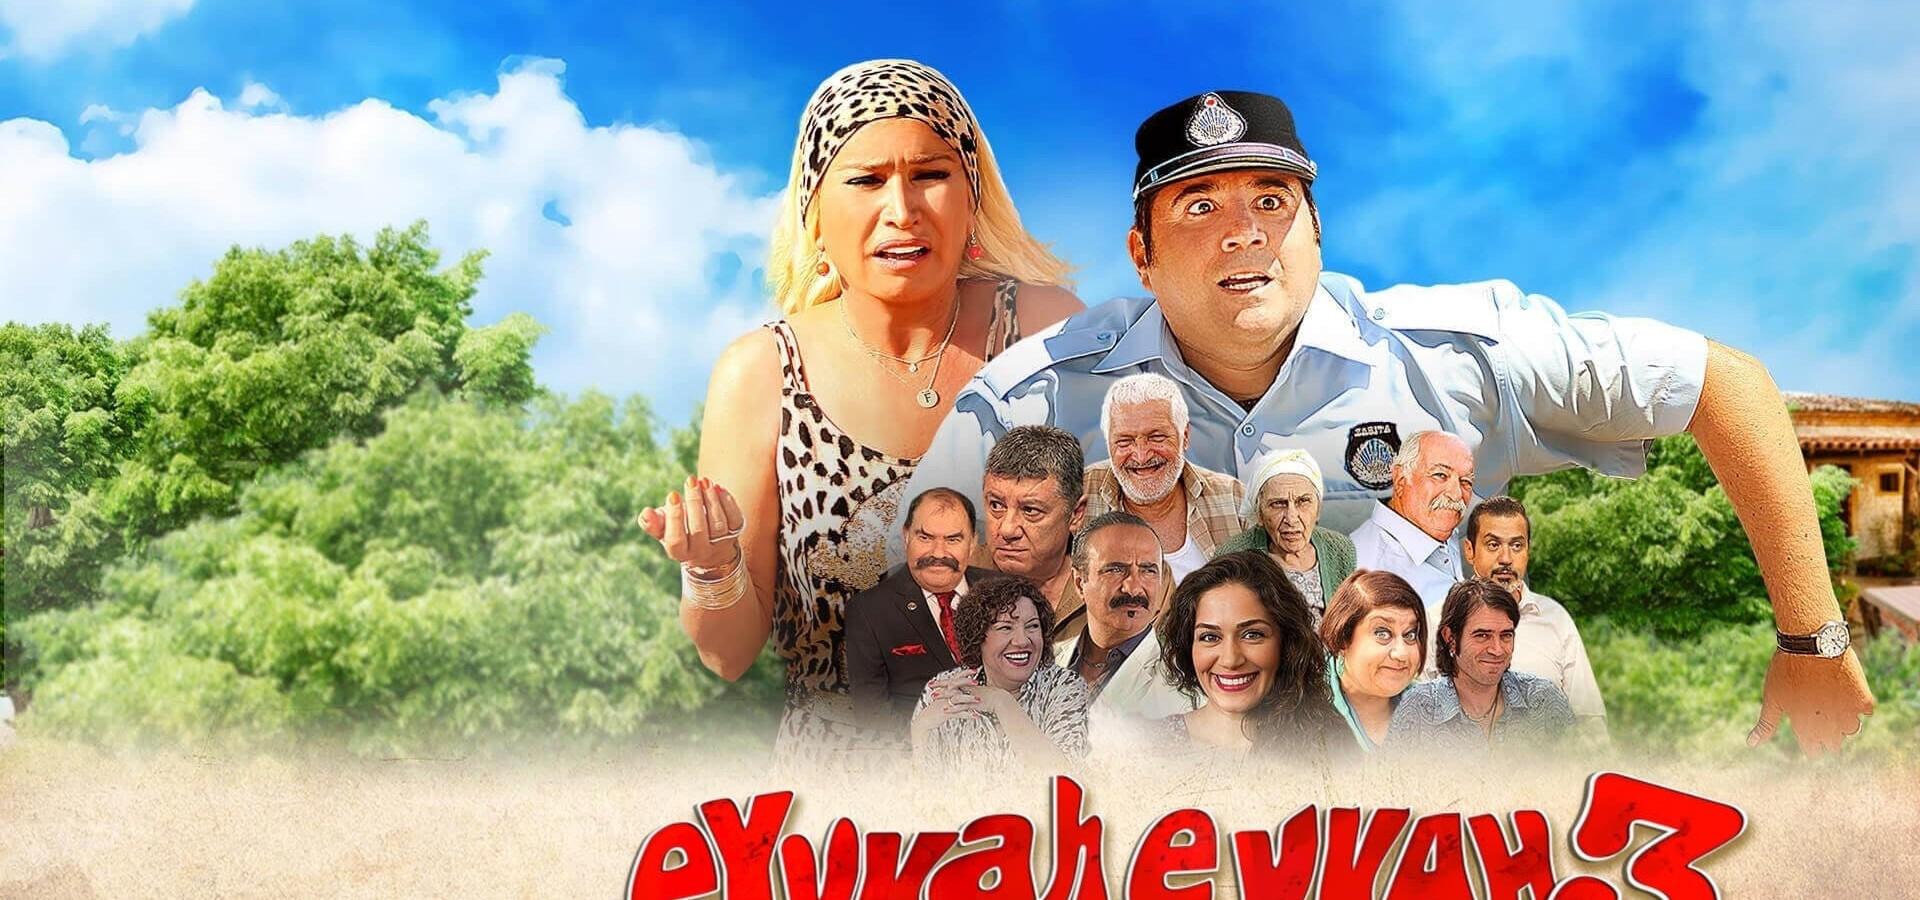 Eyyvah Eyvah 3